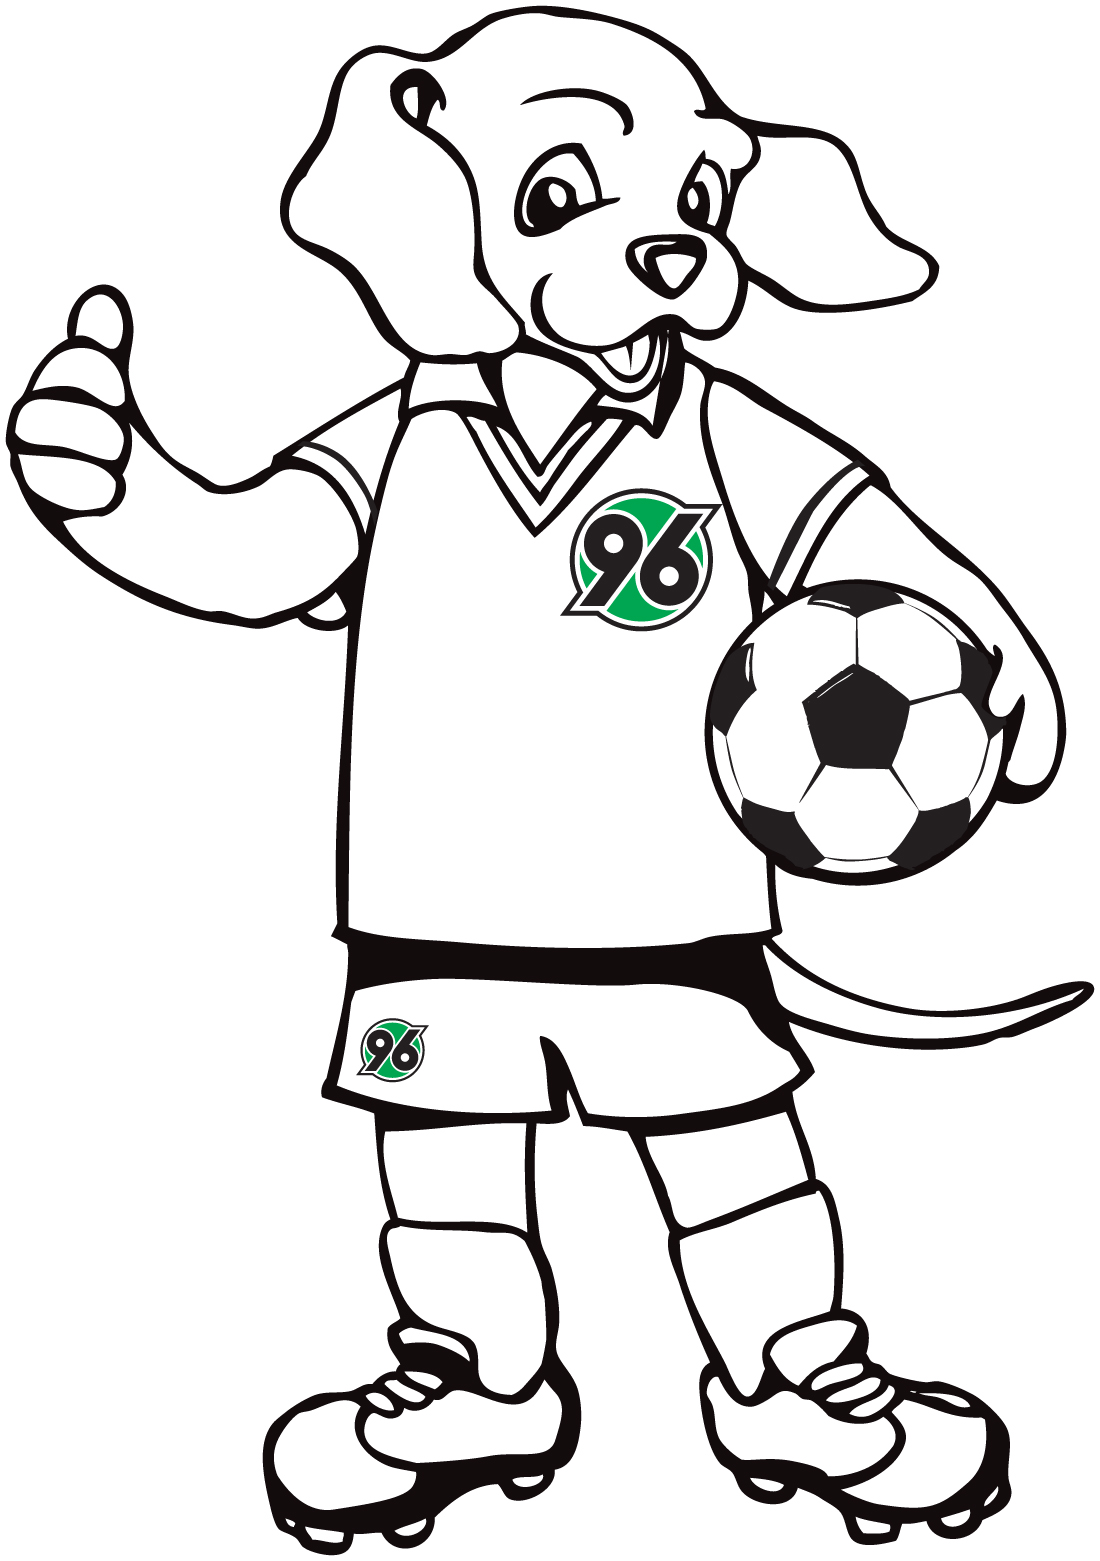 Fussball Ausmalbilder Bundesliga 06 Mandalas Zum Ausmalen